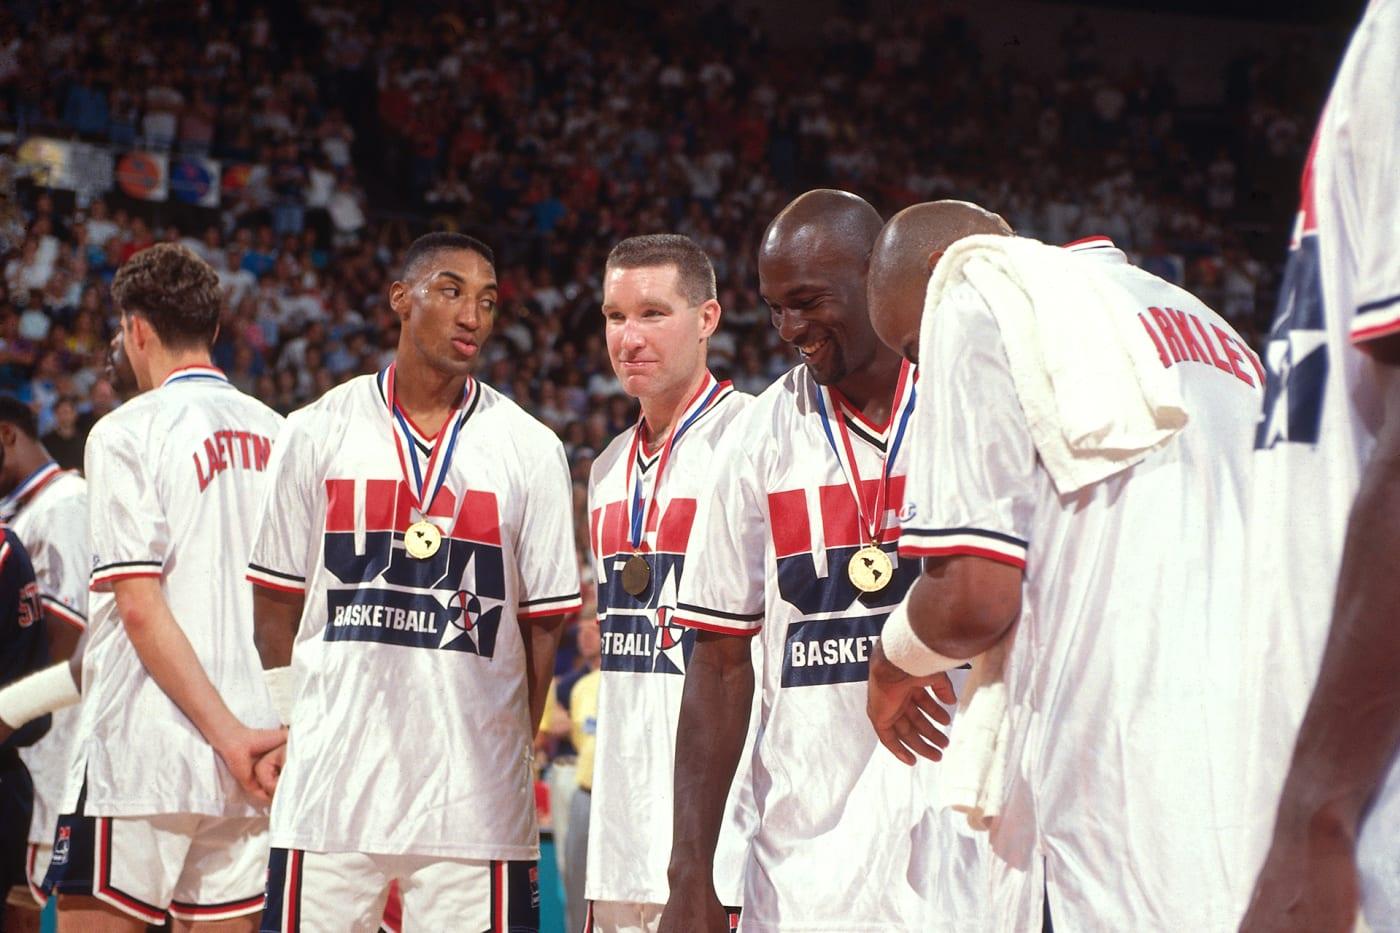 Scottie Pippen, Chris Mullin, Michael Jordan and Charles Barkley 1992 U.S. Men's Olympics Basketball Gold Medals